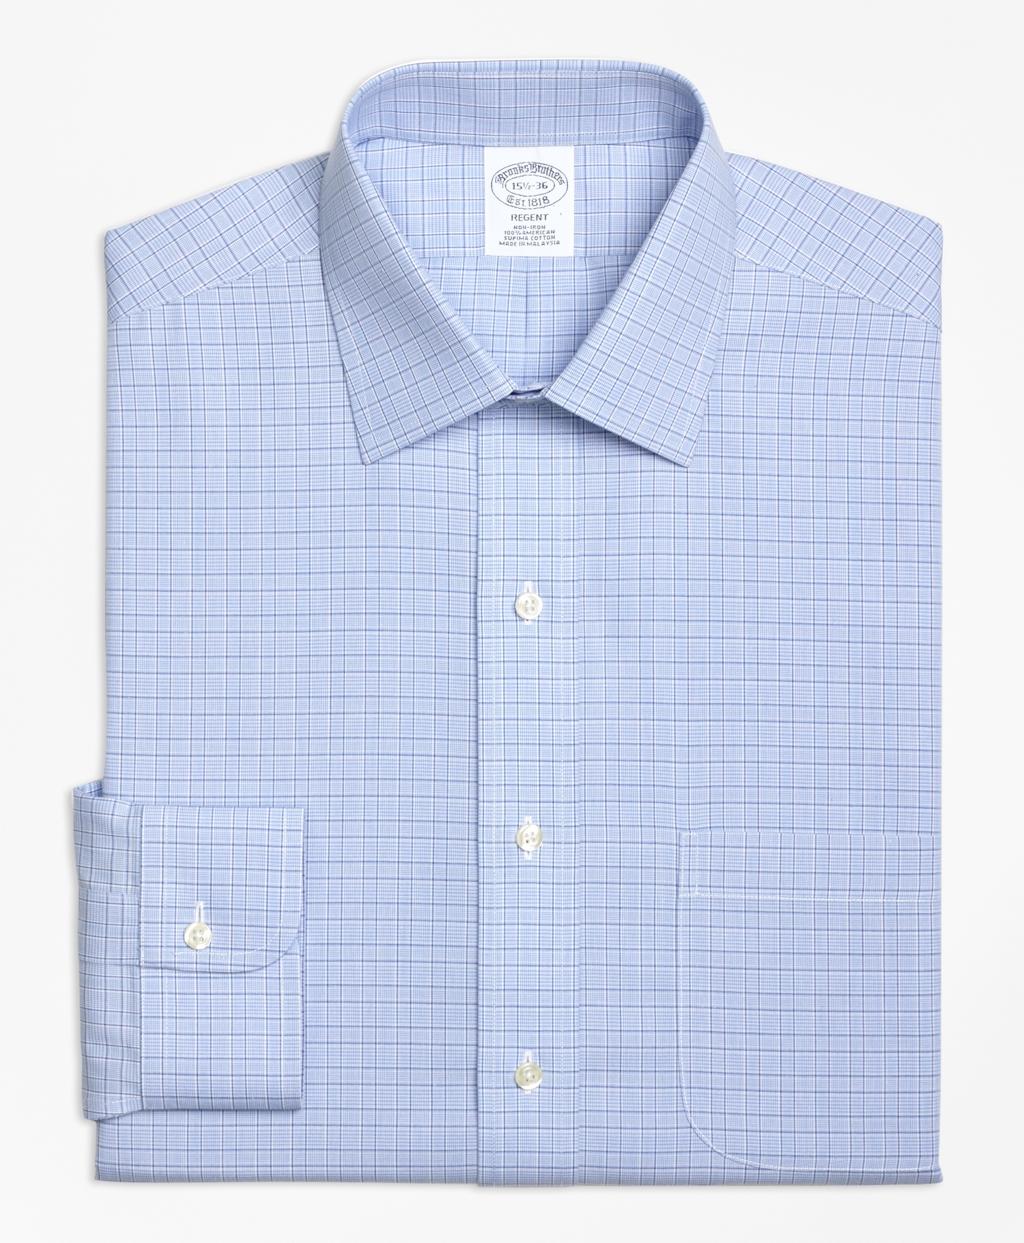 5c9794c6abc9 Regent Fitted Dress Shirt, Non-Iron Glen Plaid - Brooks Brothers